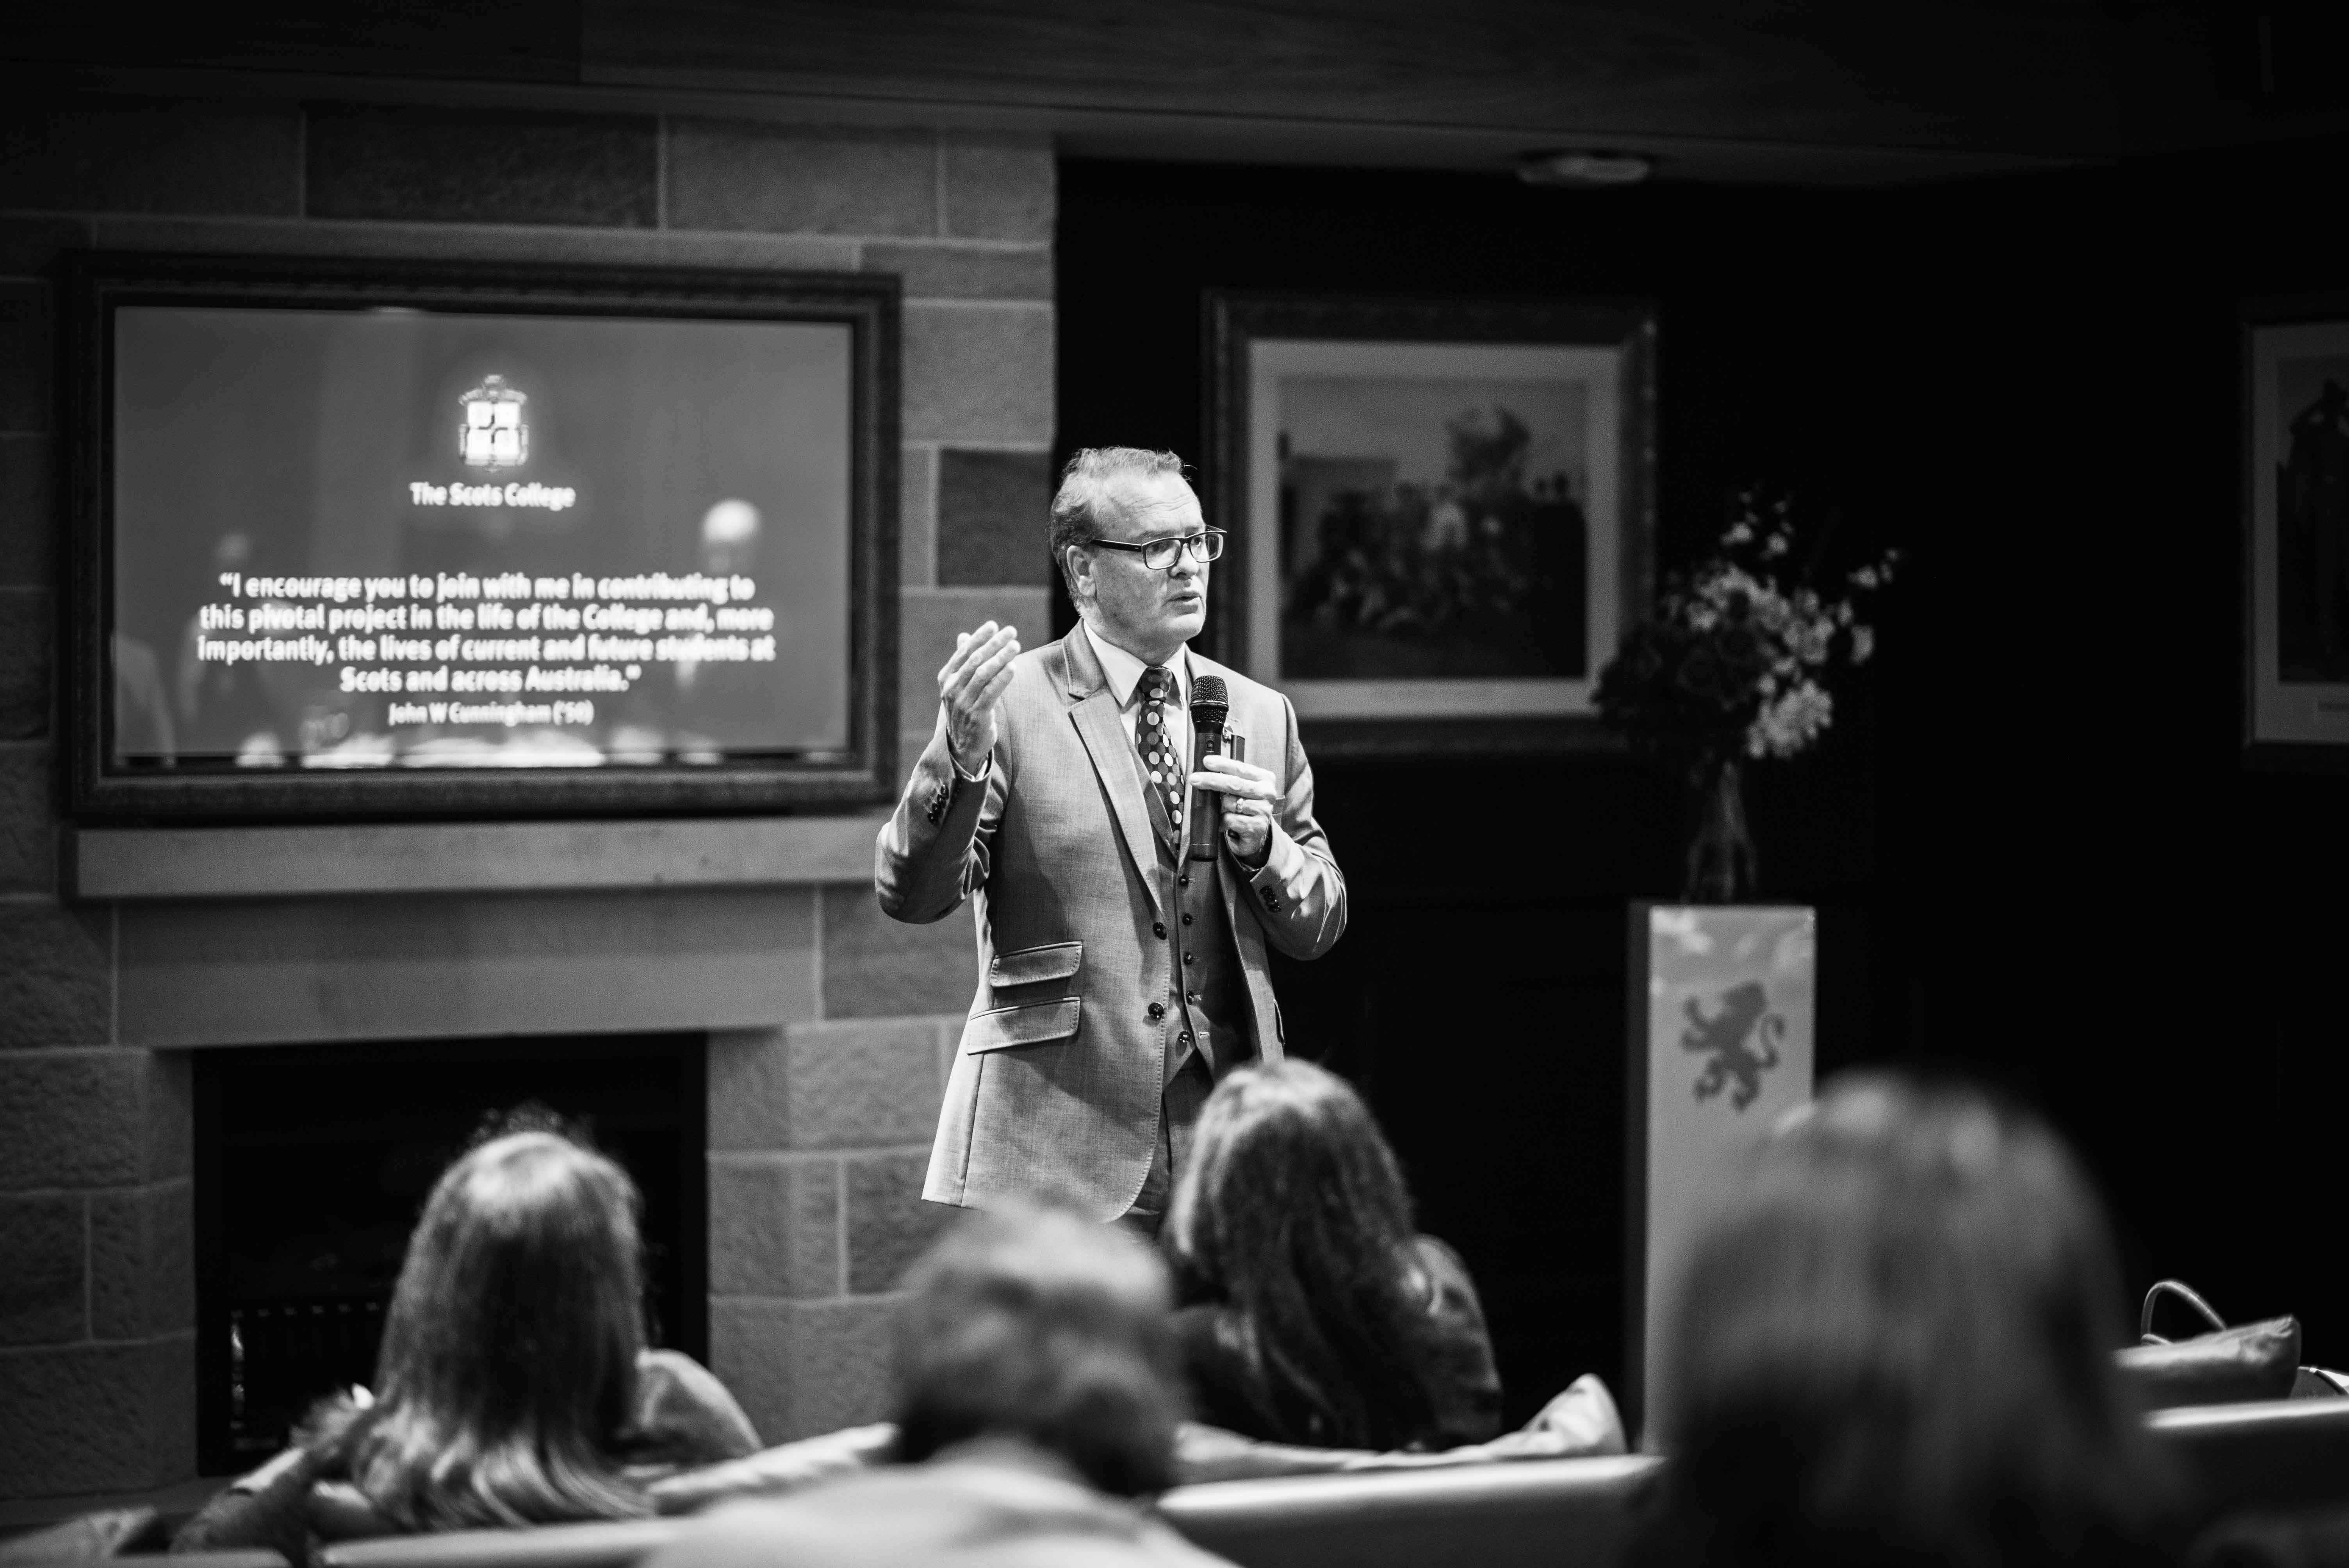 Dr Lambert speaking Patribus